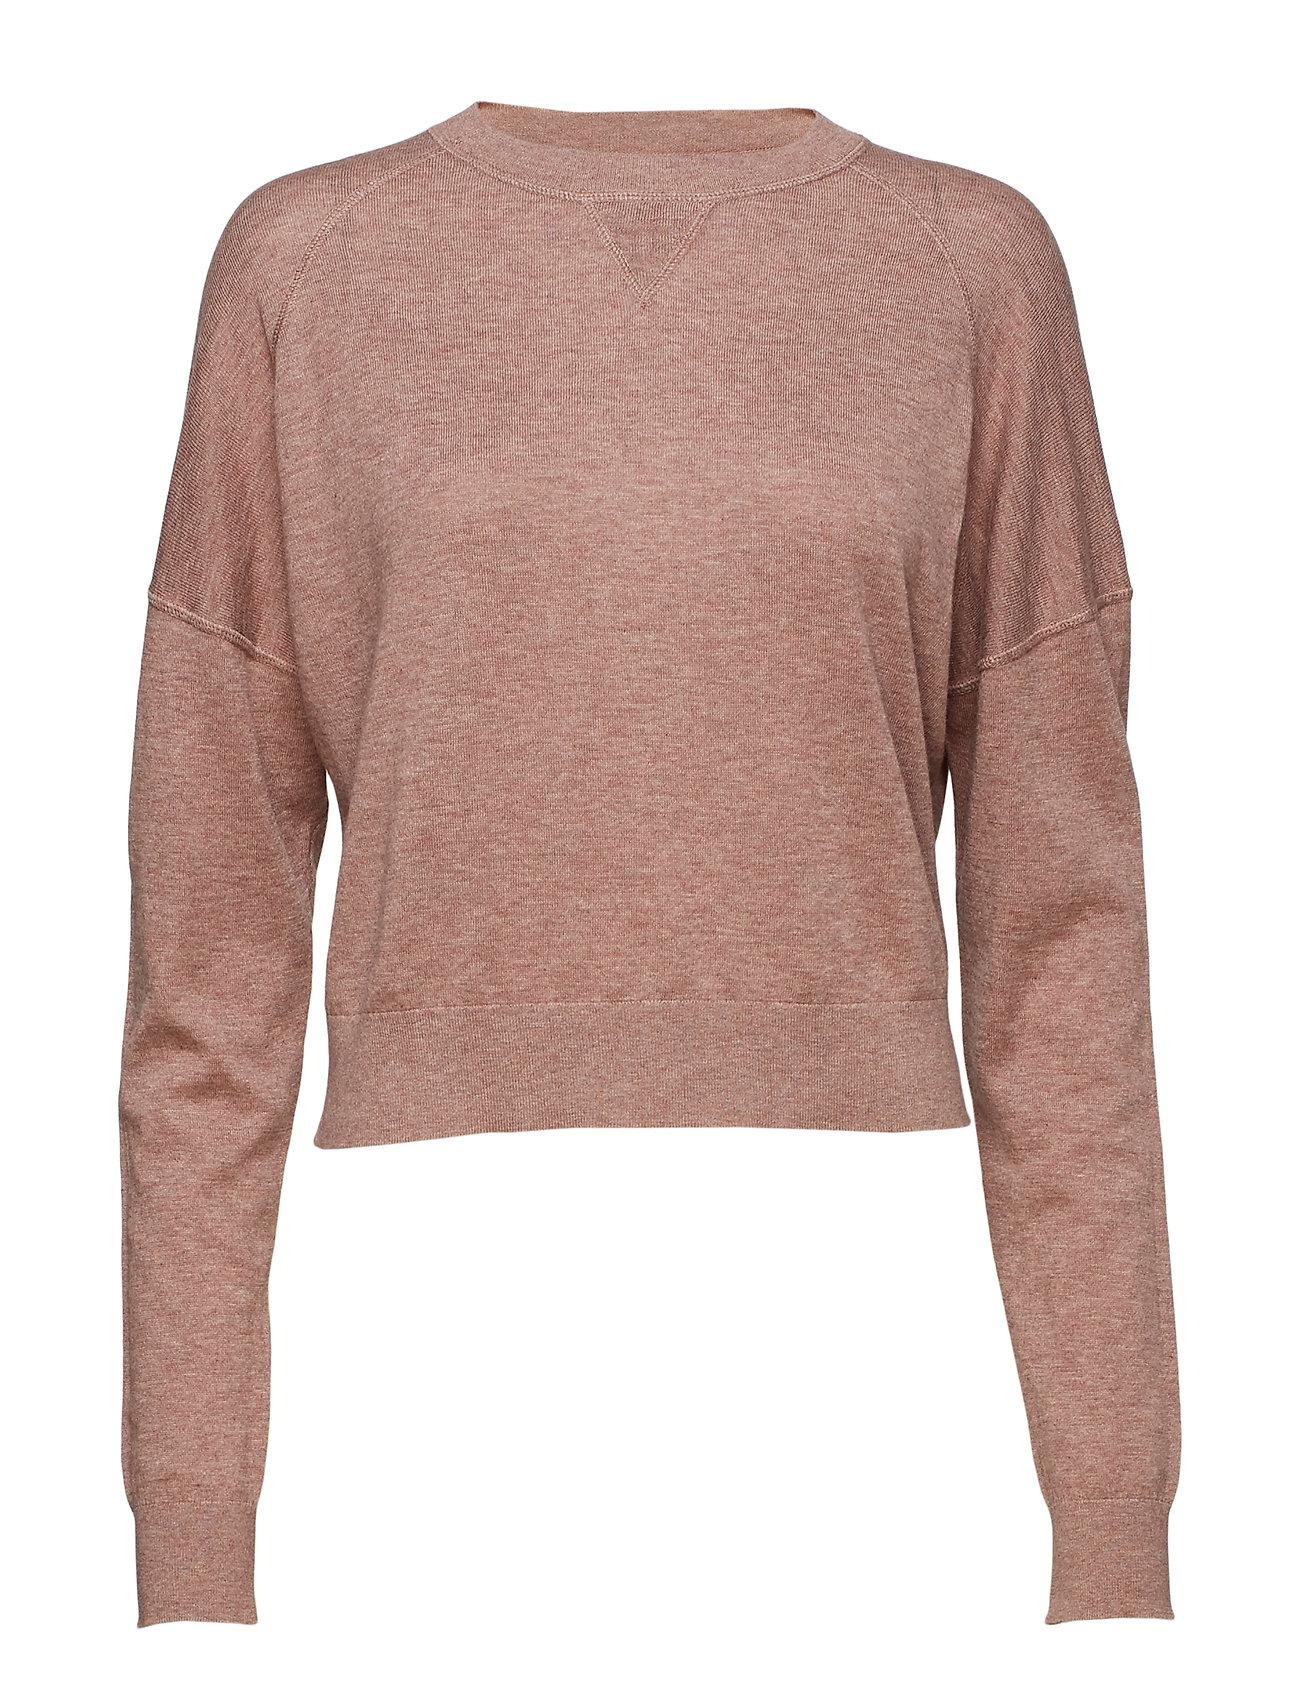 Filippa K Soft Sport Light Knit Sweatshirt - MINK MEL.